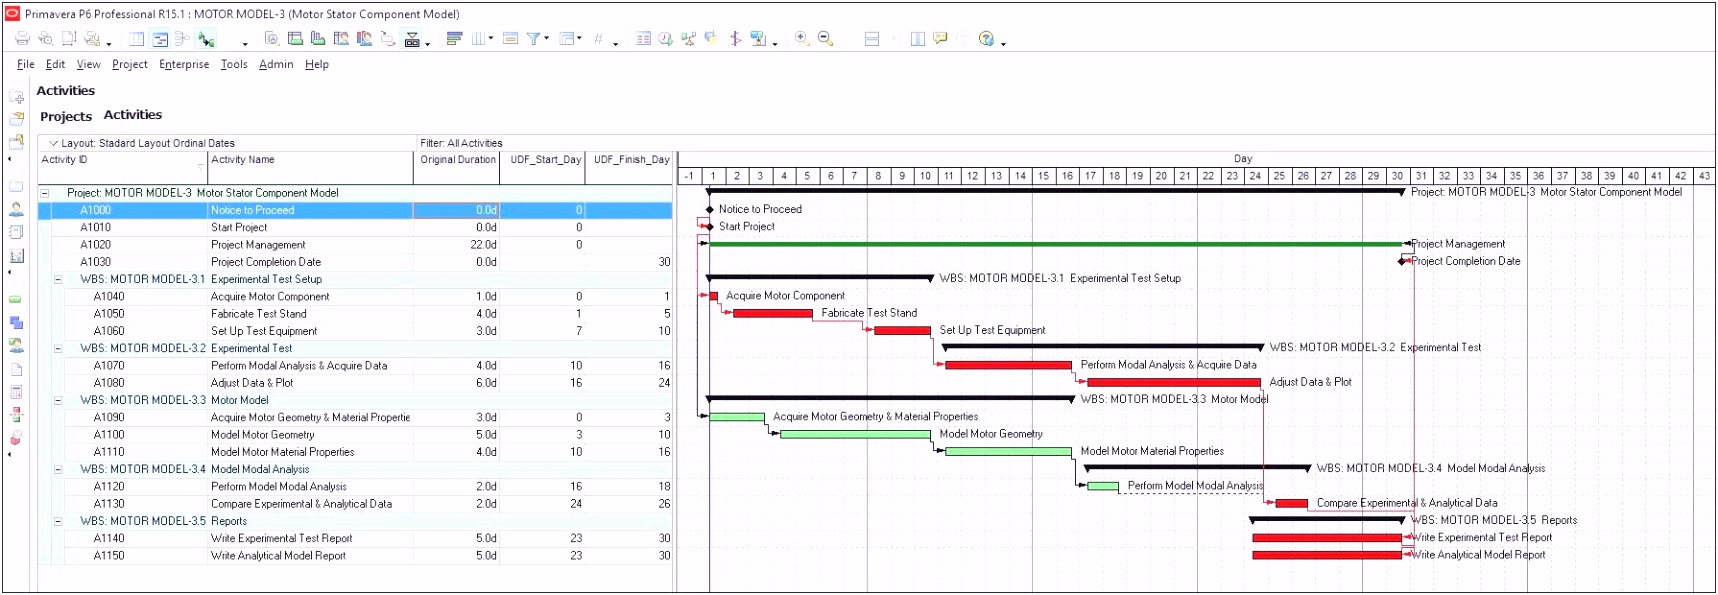 Projektplanung Beispiel Genial Projektplanung Vorlage — TRXITALIA